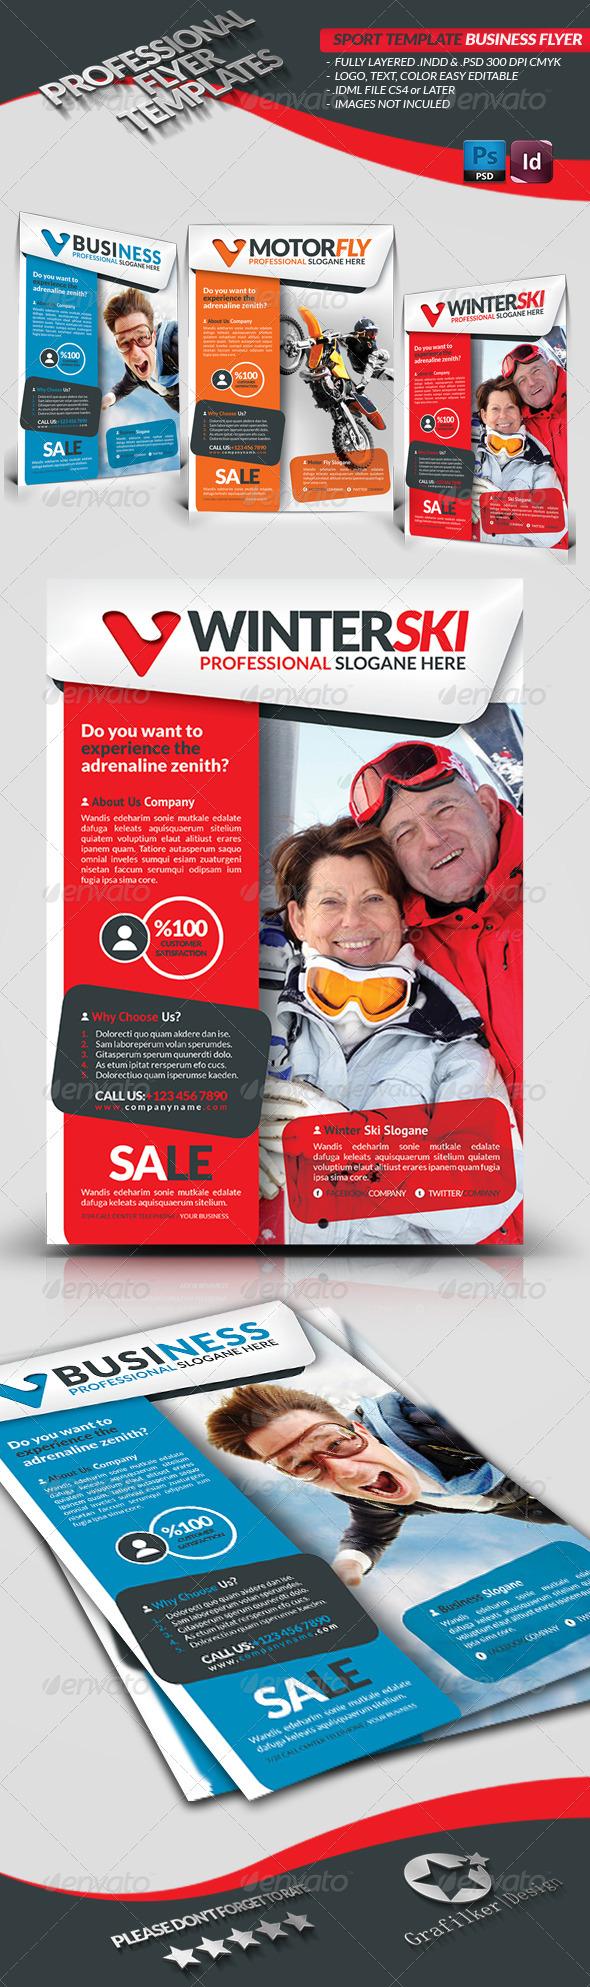 Sport Template Business Flyer - Corporate Flyers